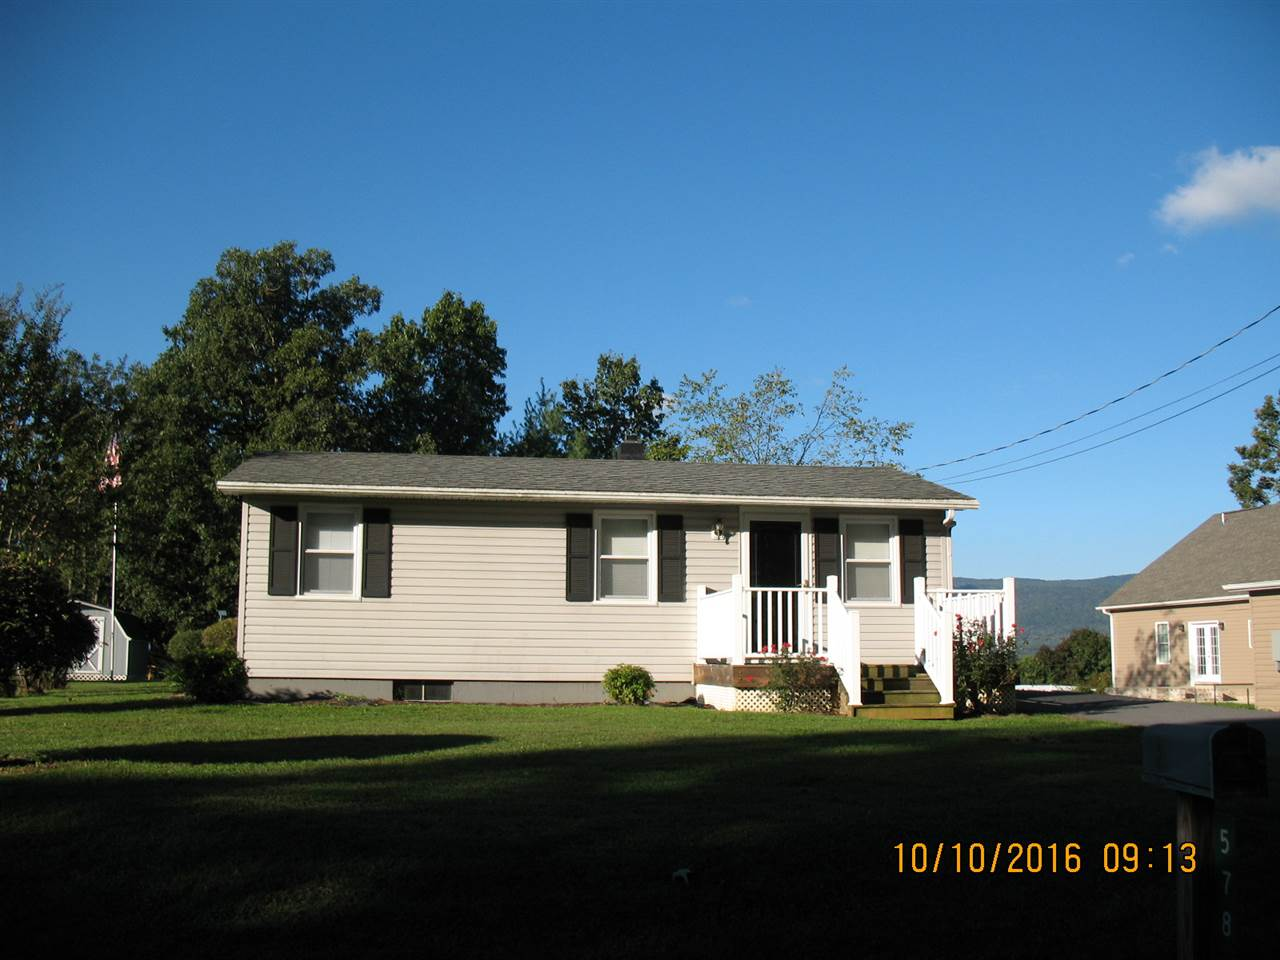 578 Massanutten Ave, Shenandoah, VA 22849